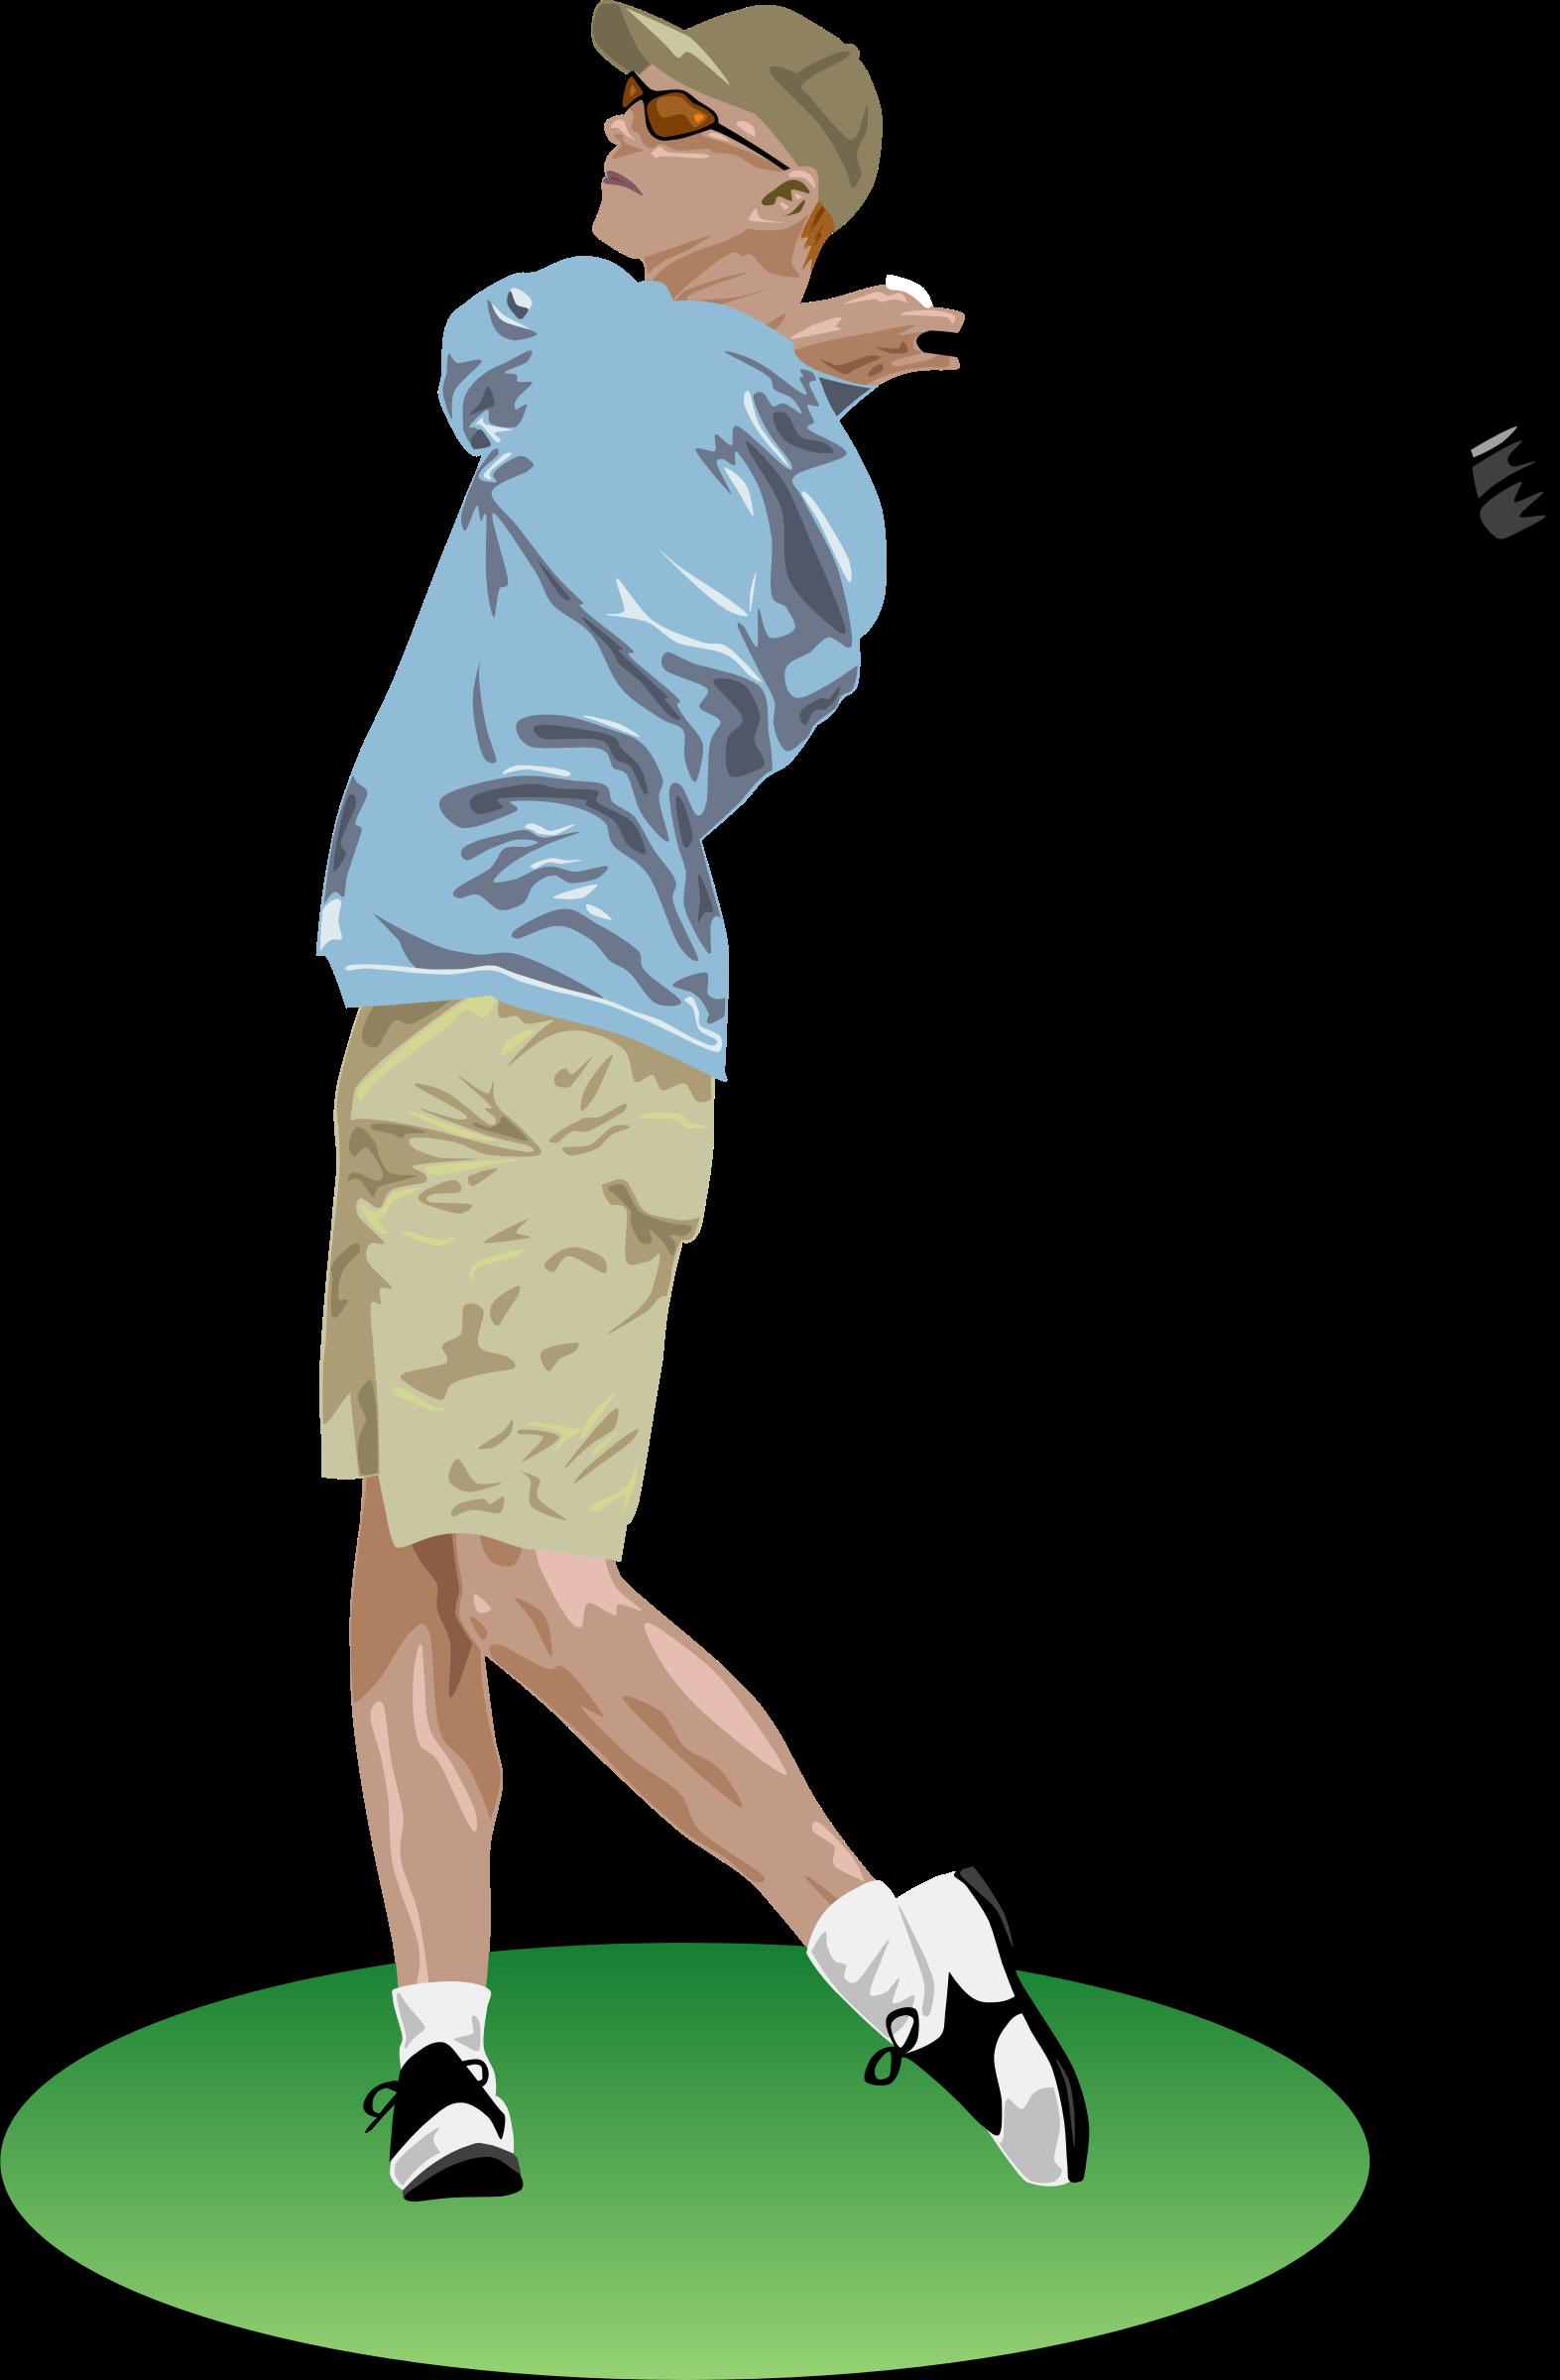 Golfing clipart golf theme. Drive big image png